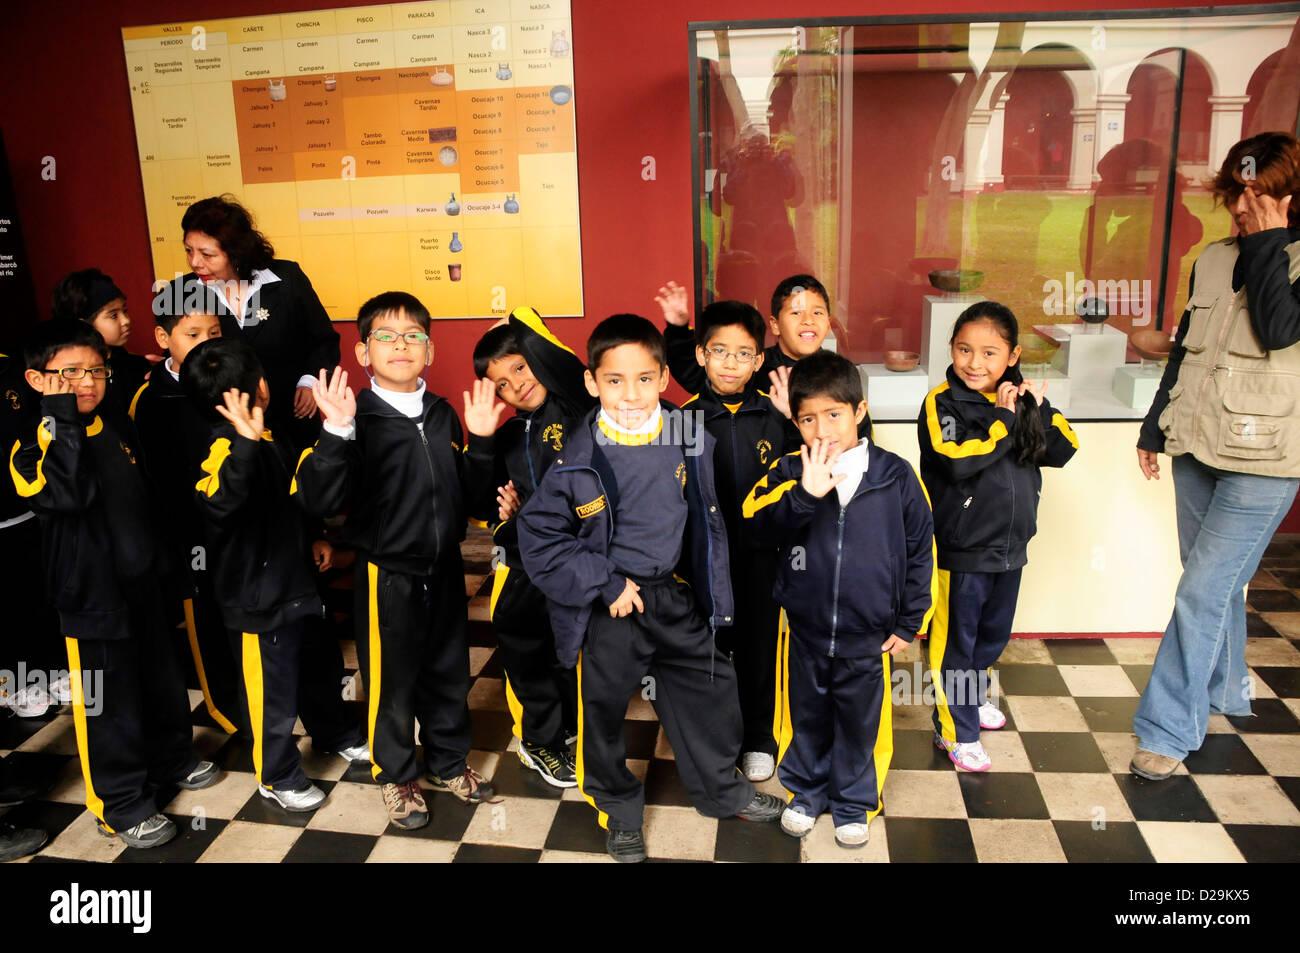 Class At Museum, Lima, Peru - Stock Image